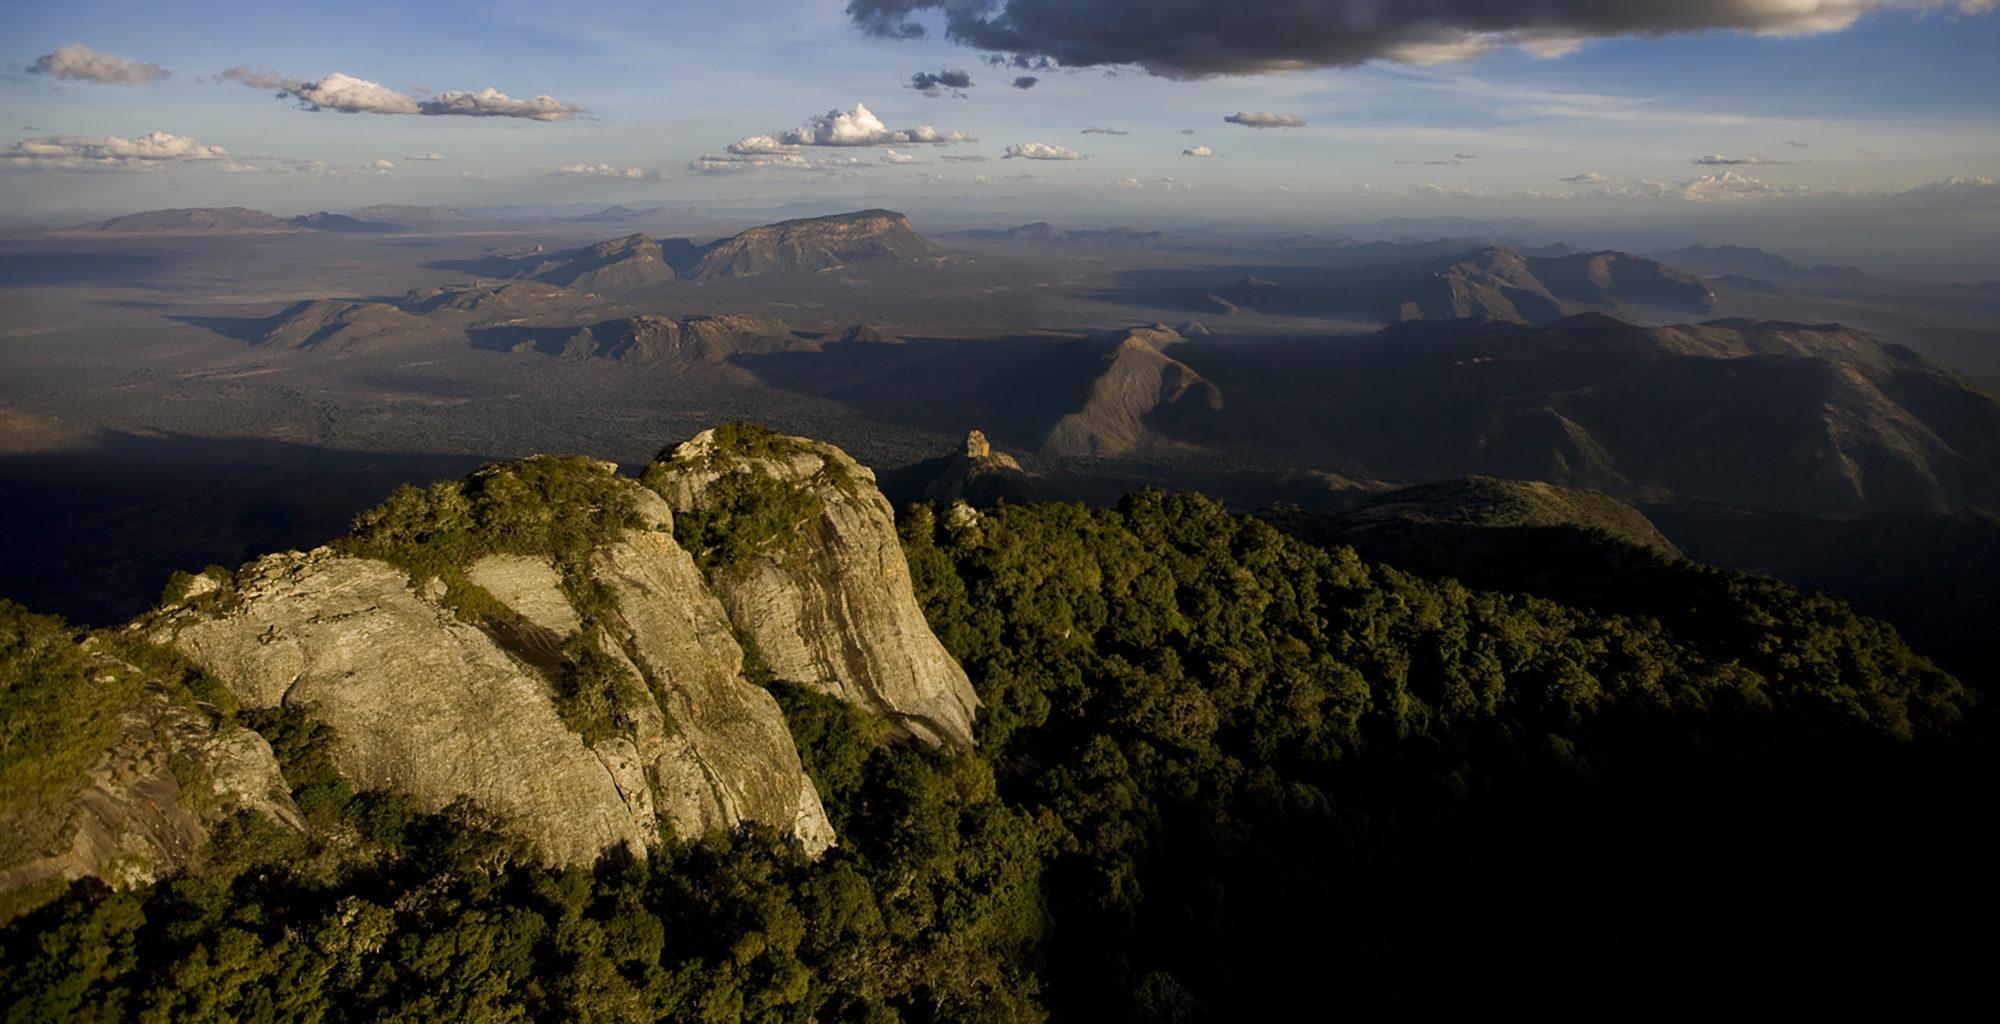 Kenya-Samburu-National-Reserve-Landscape